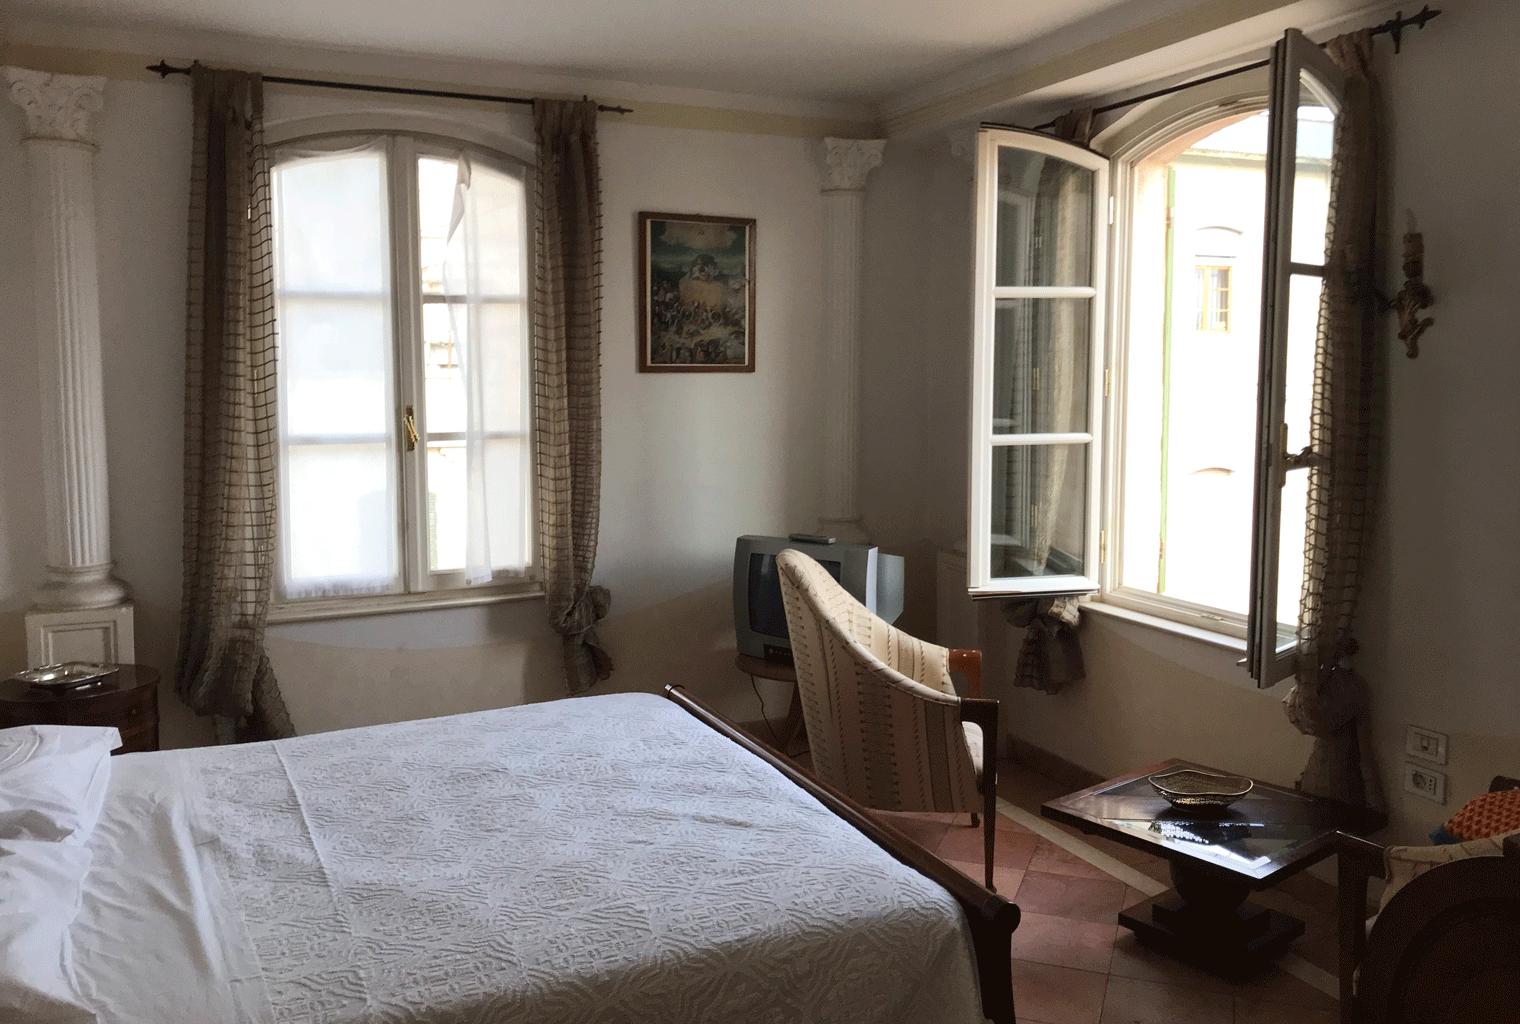 Albergo-Italia-Eritra-Bedroom